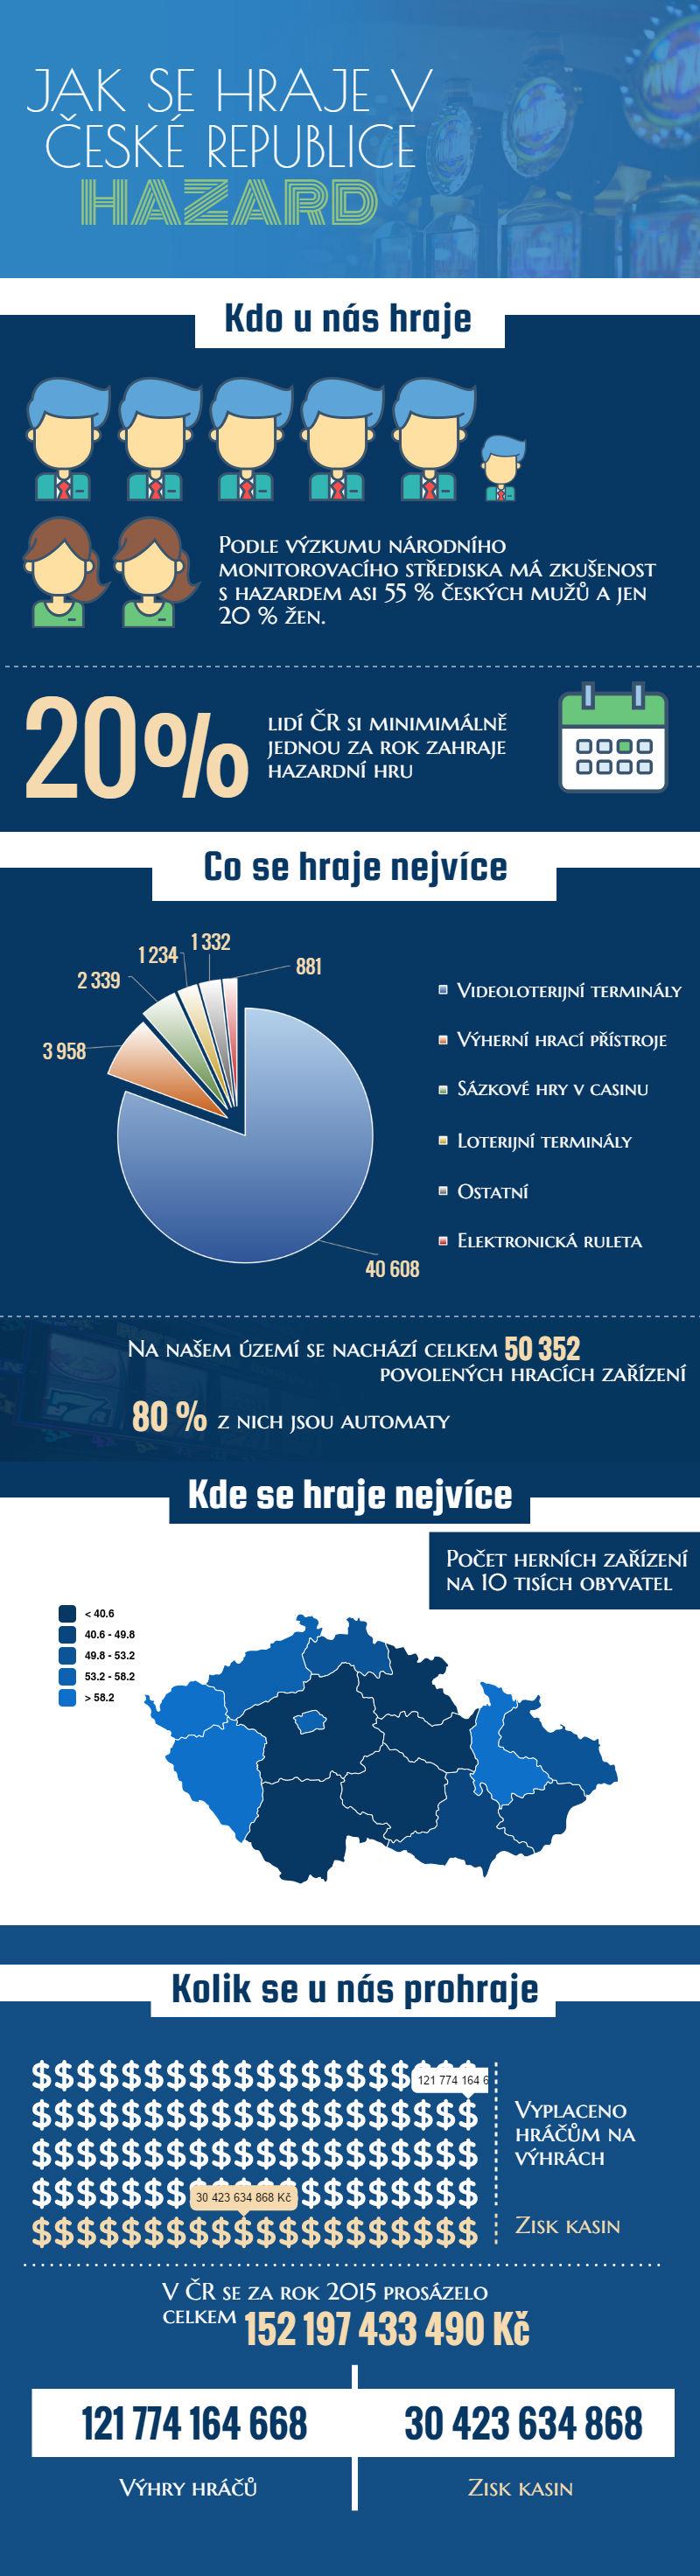 Hazard v České republice - infografika